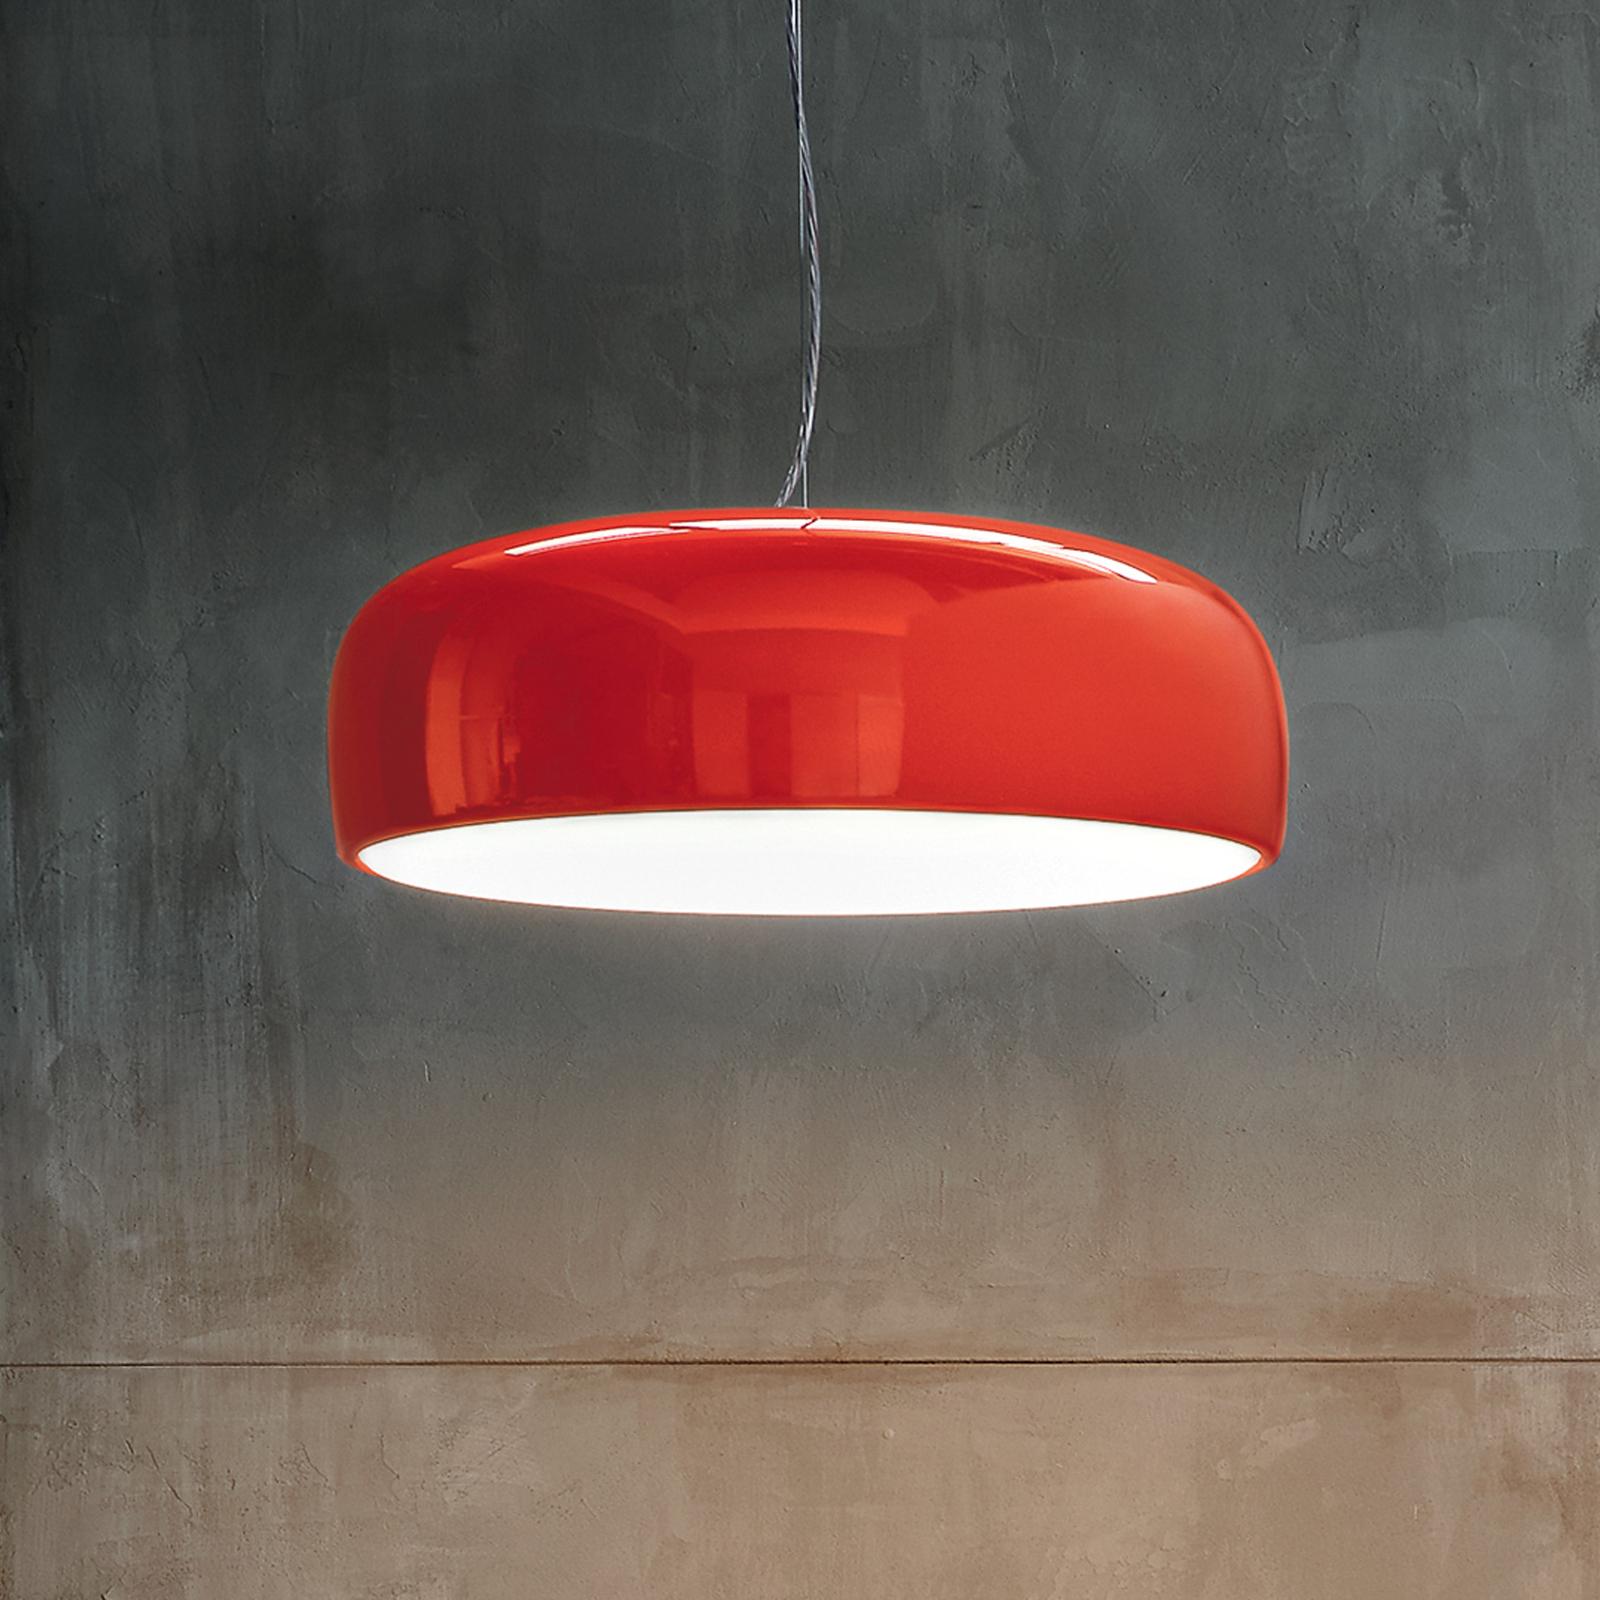 FLOS Smithfield S LED-Hängeleuchte in Rot